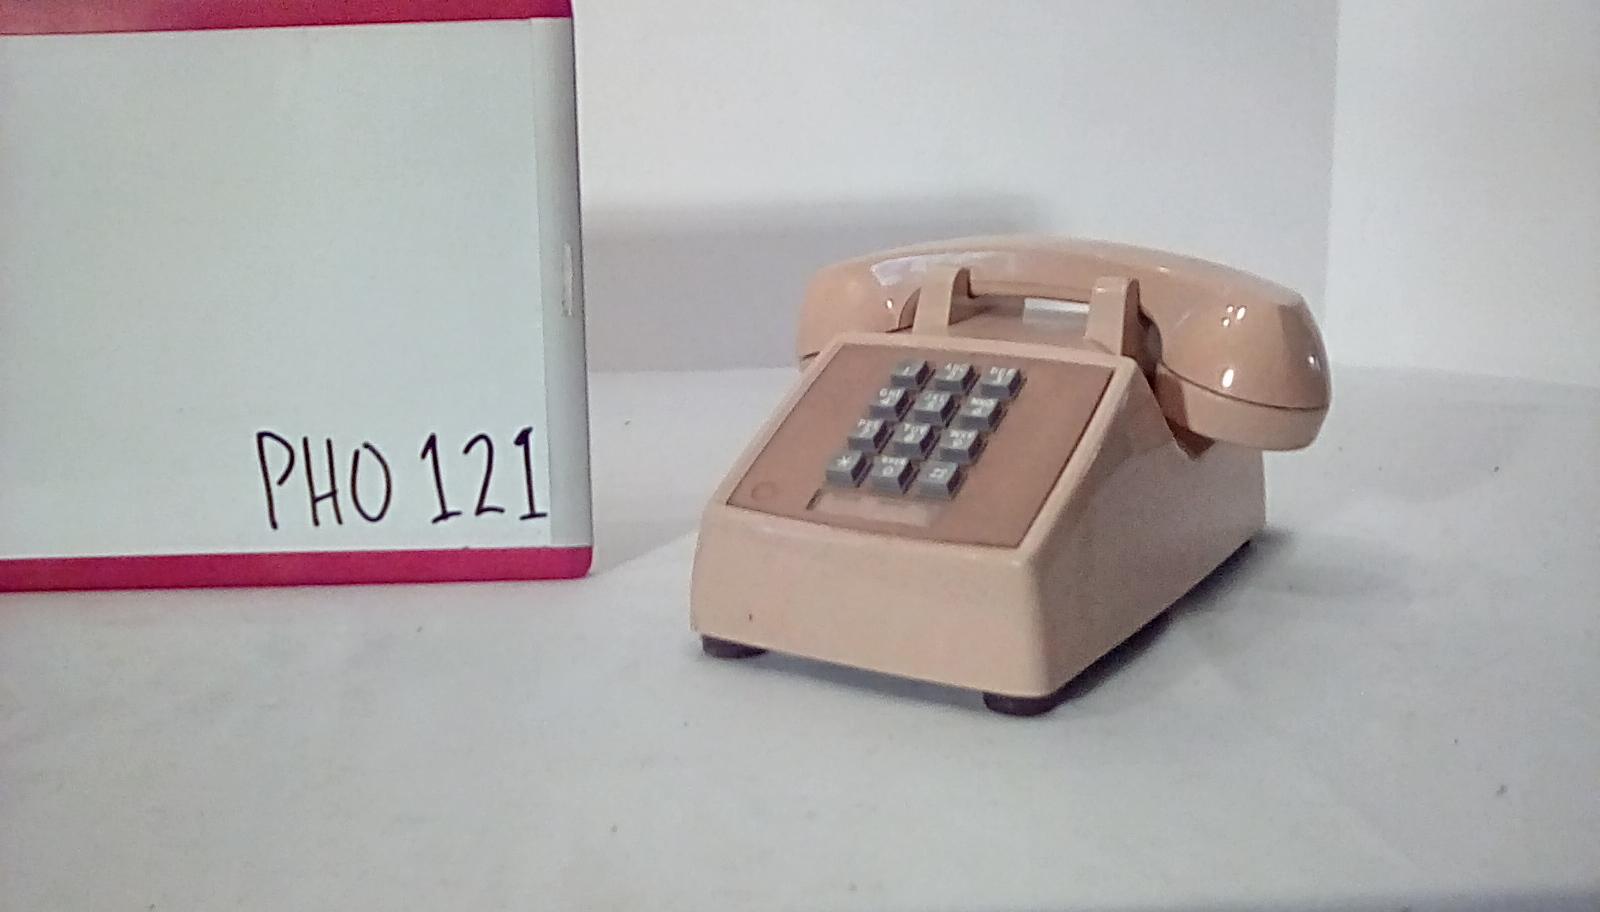 PHO121 Beige generic push button desk phone